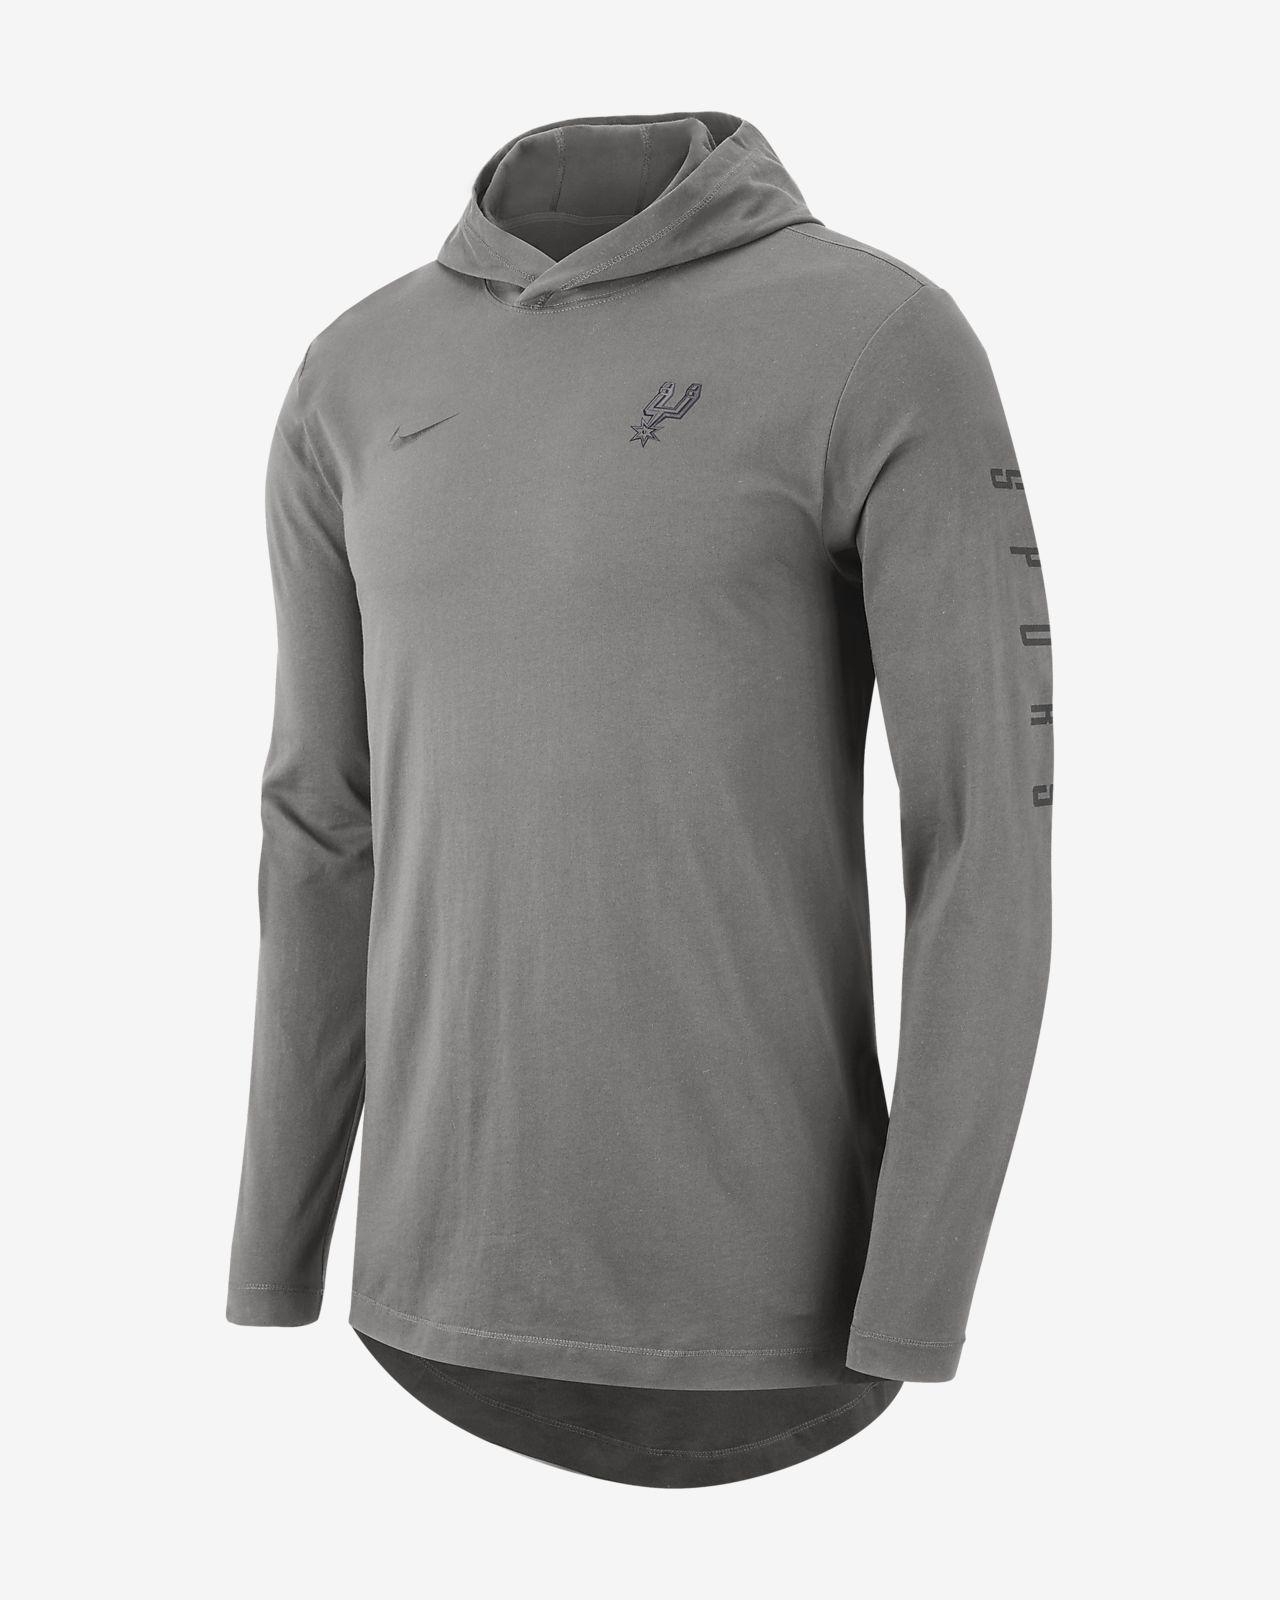 fb7824d2af2c San Antonio Spurs Nike Men s Hooded Long-Sleeve NBA T-Shirt. Nike.com